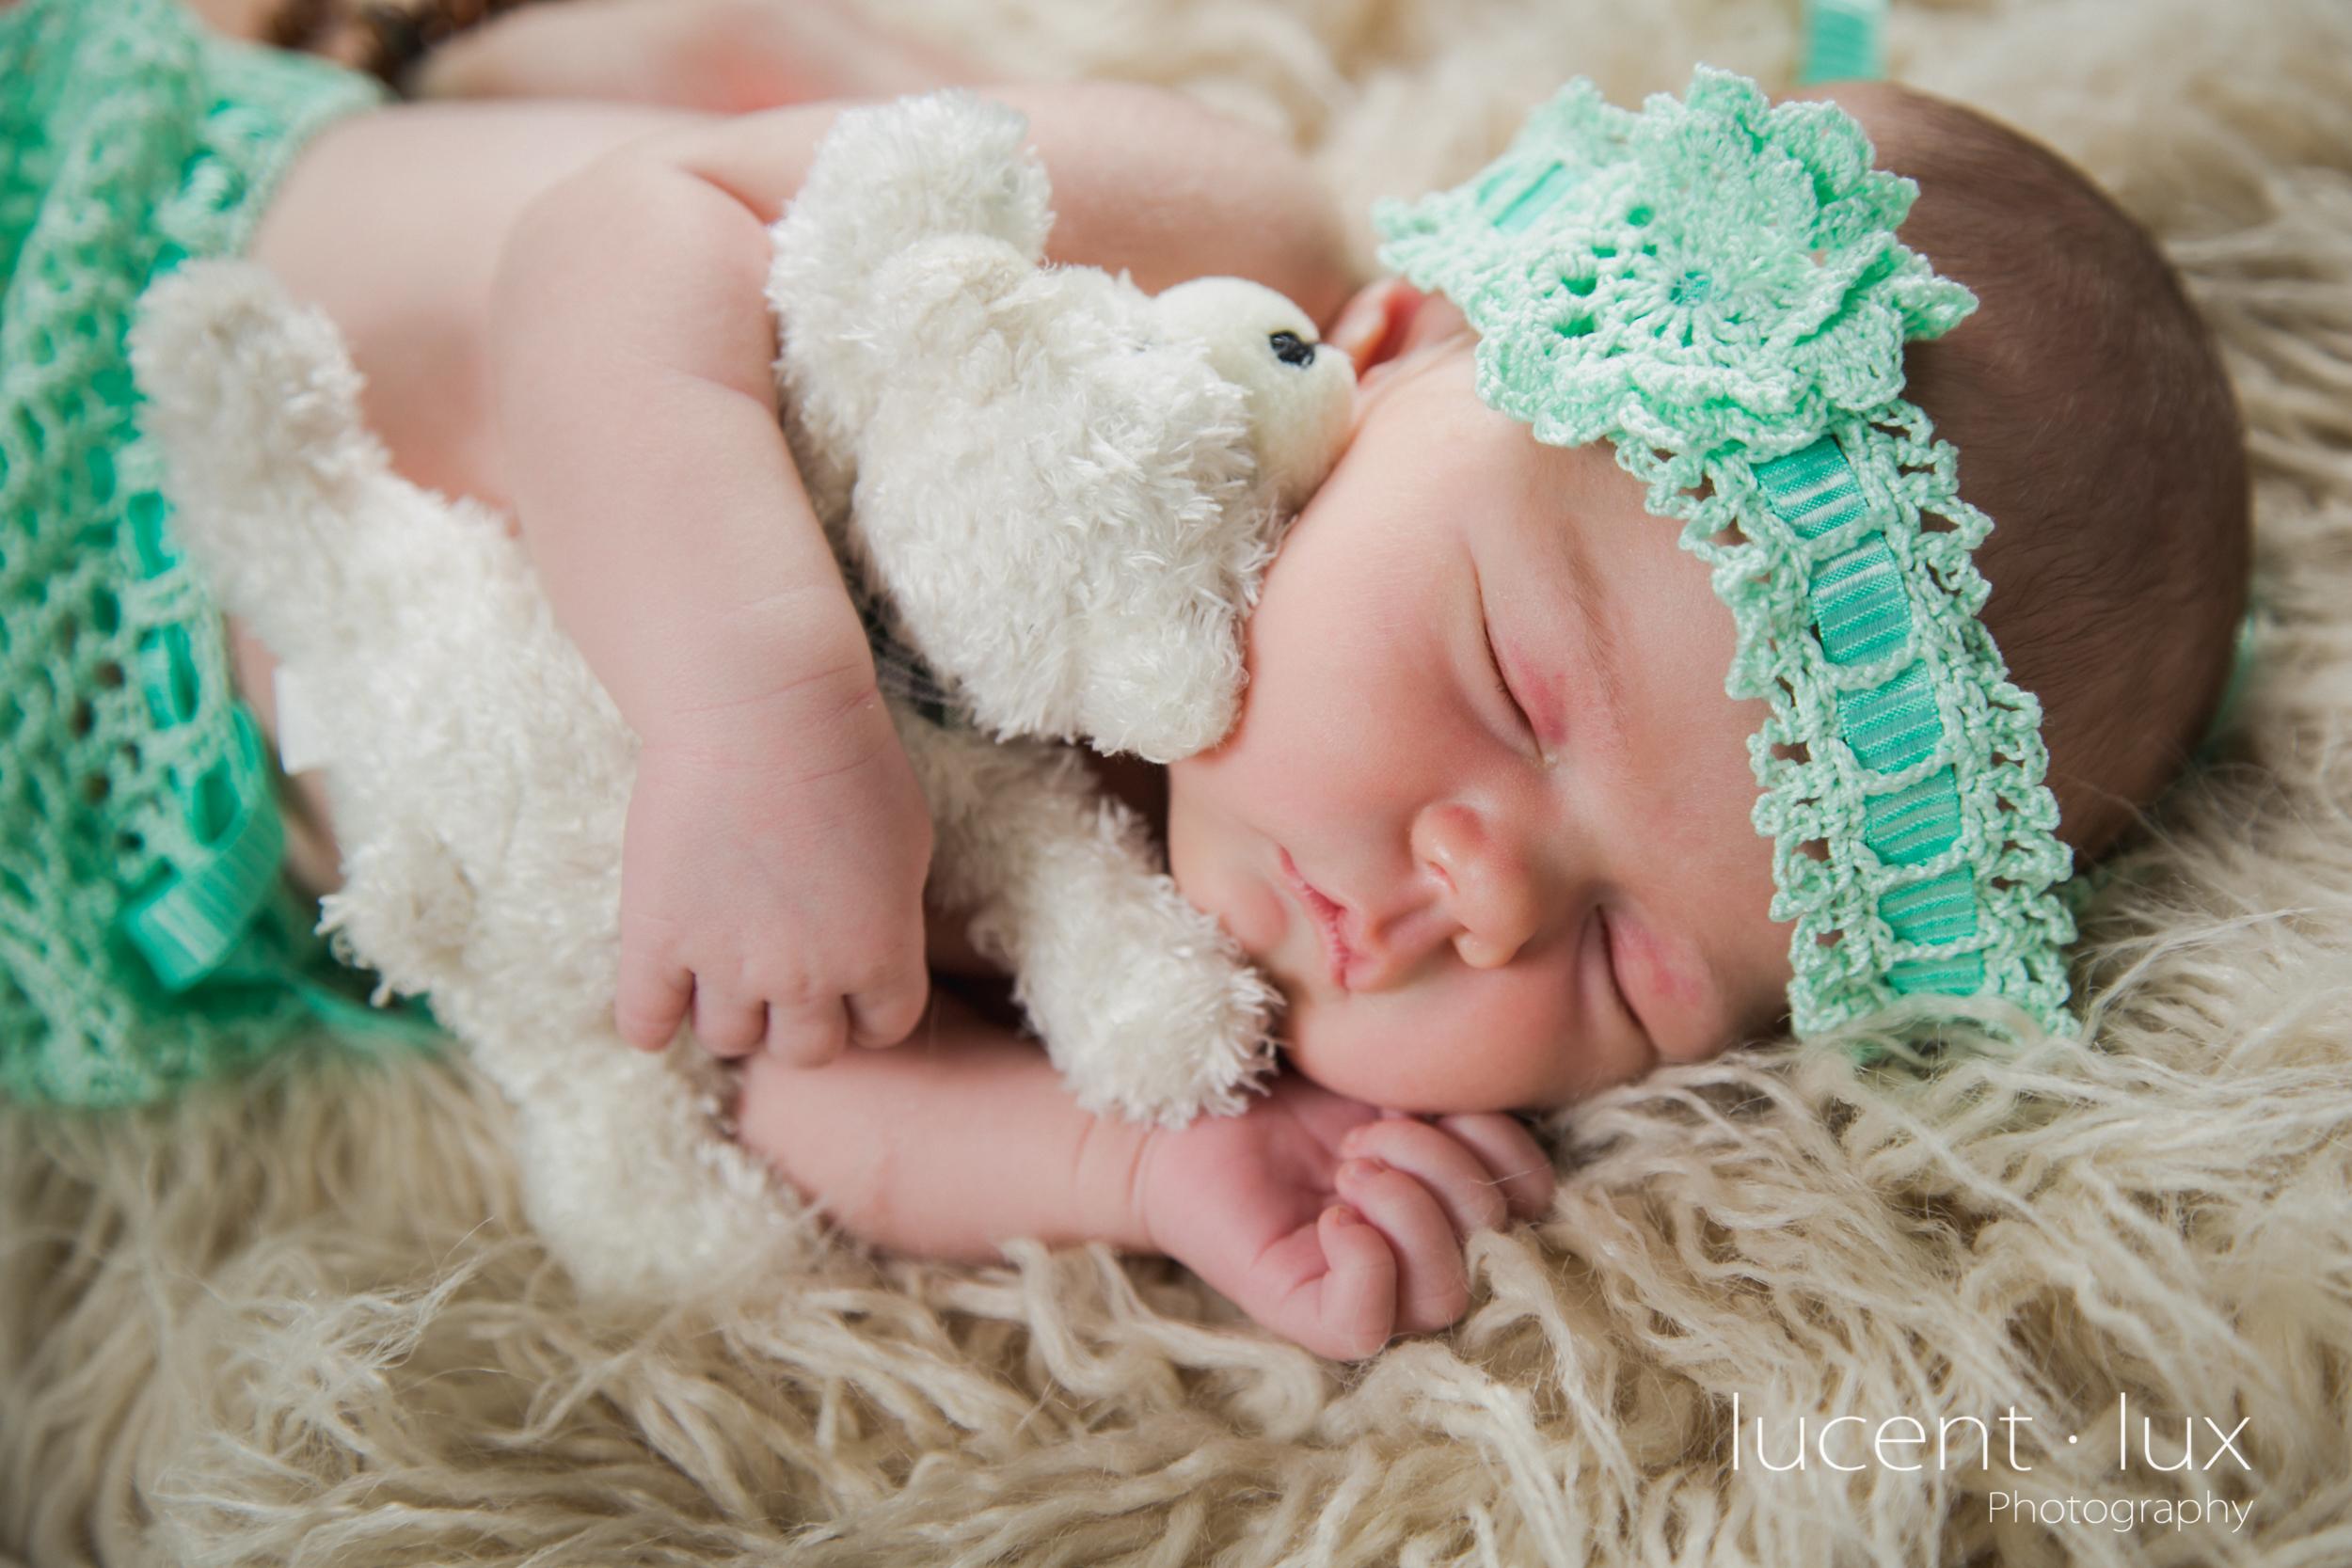 Baltimore-Newborn-Maryland-Maternity-Newborn-Photography-Washington-DC-Photographer-Portrait-Children-Baby-Photography-Family-Portraits-105.jpg